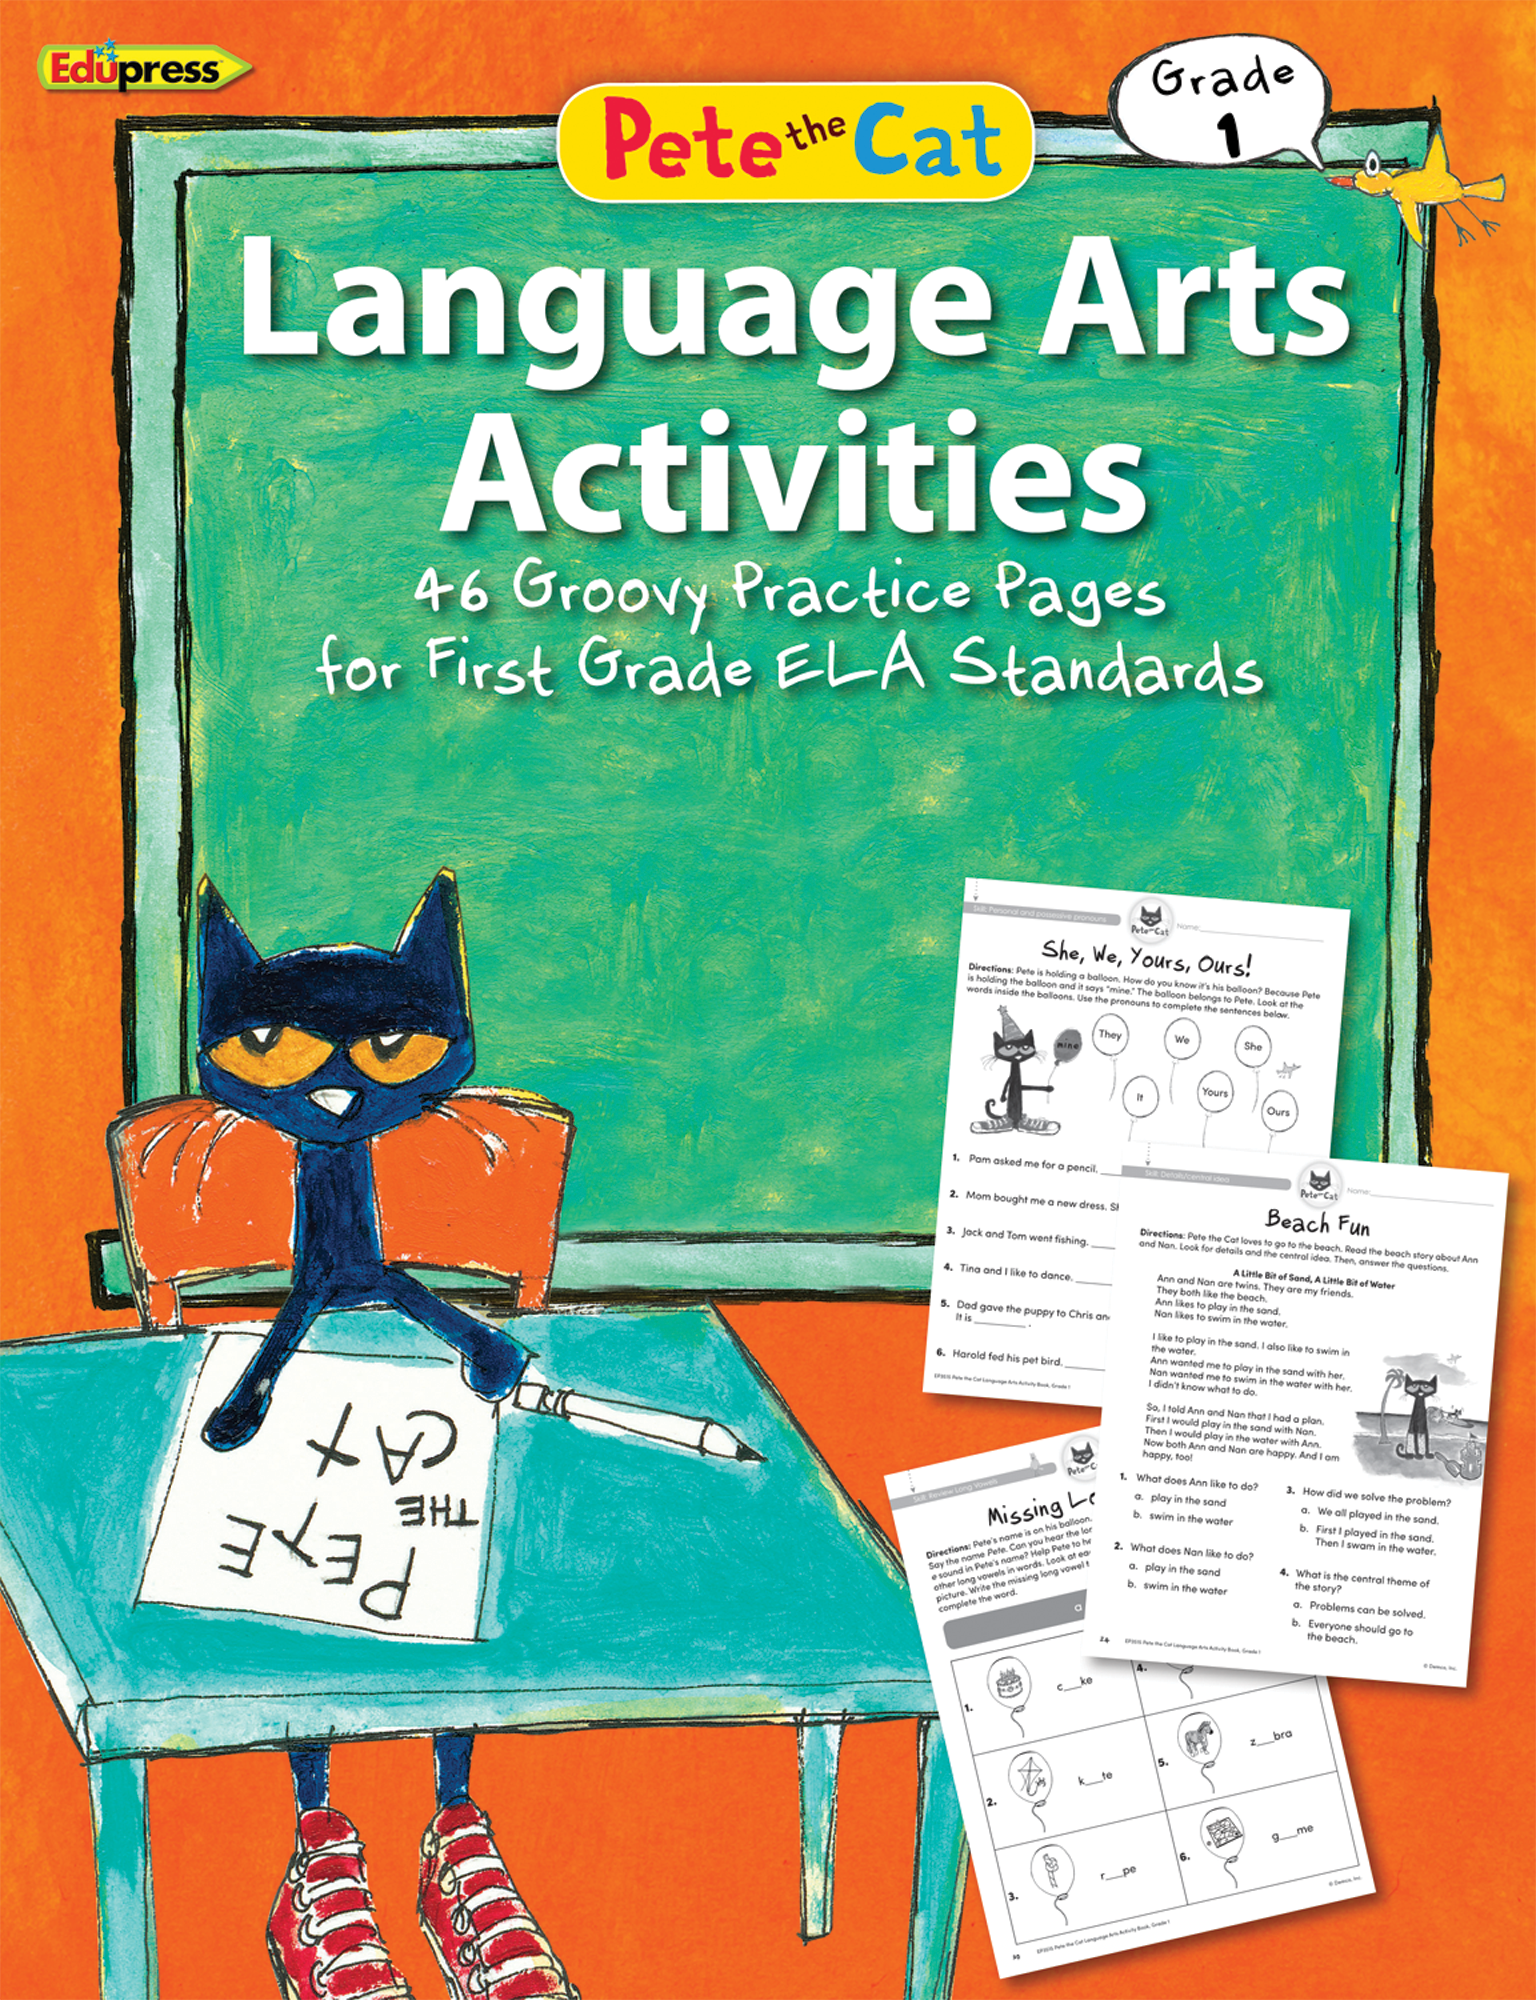 Pete The Cat Language Arts Activities Grade 1 Con